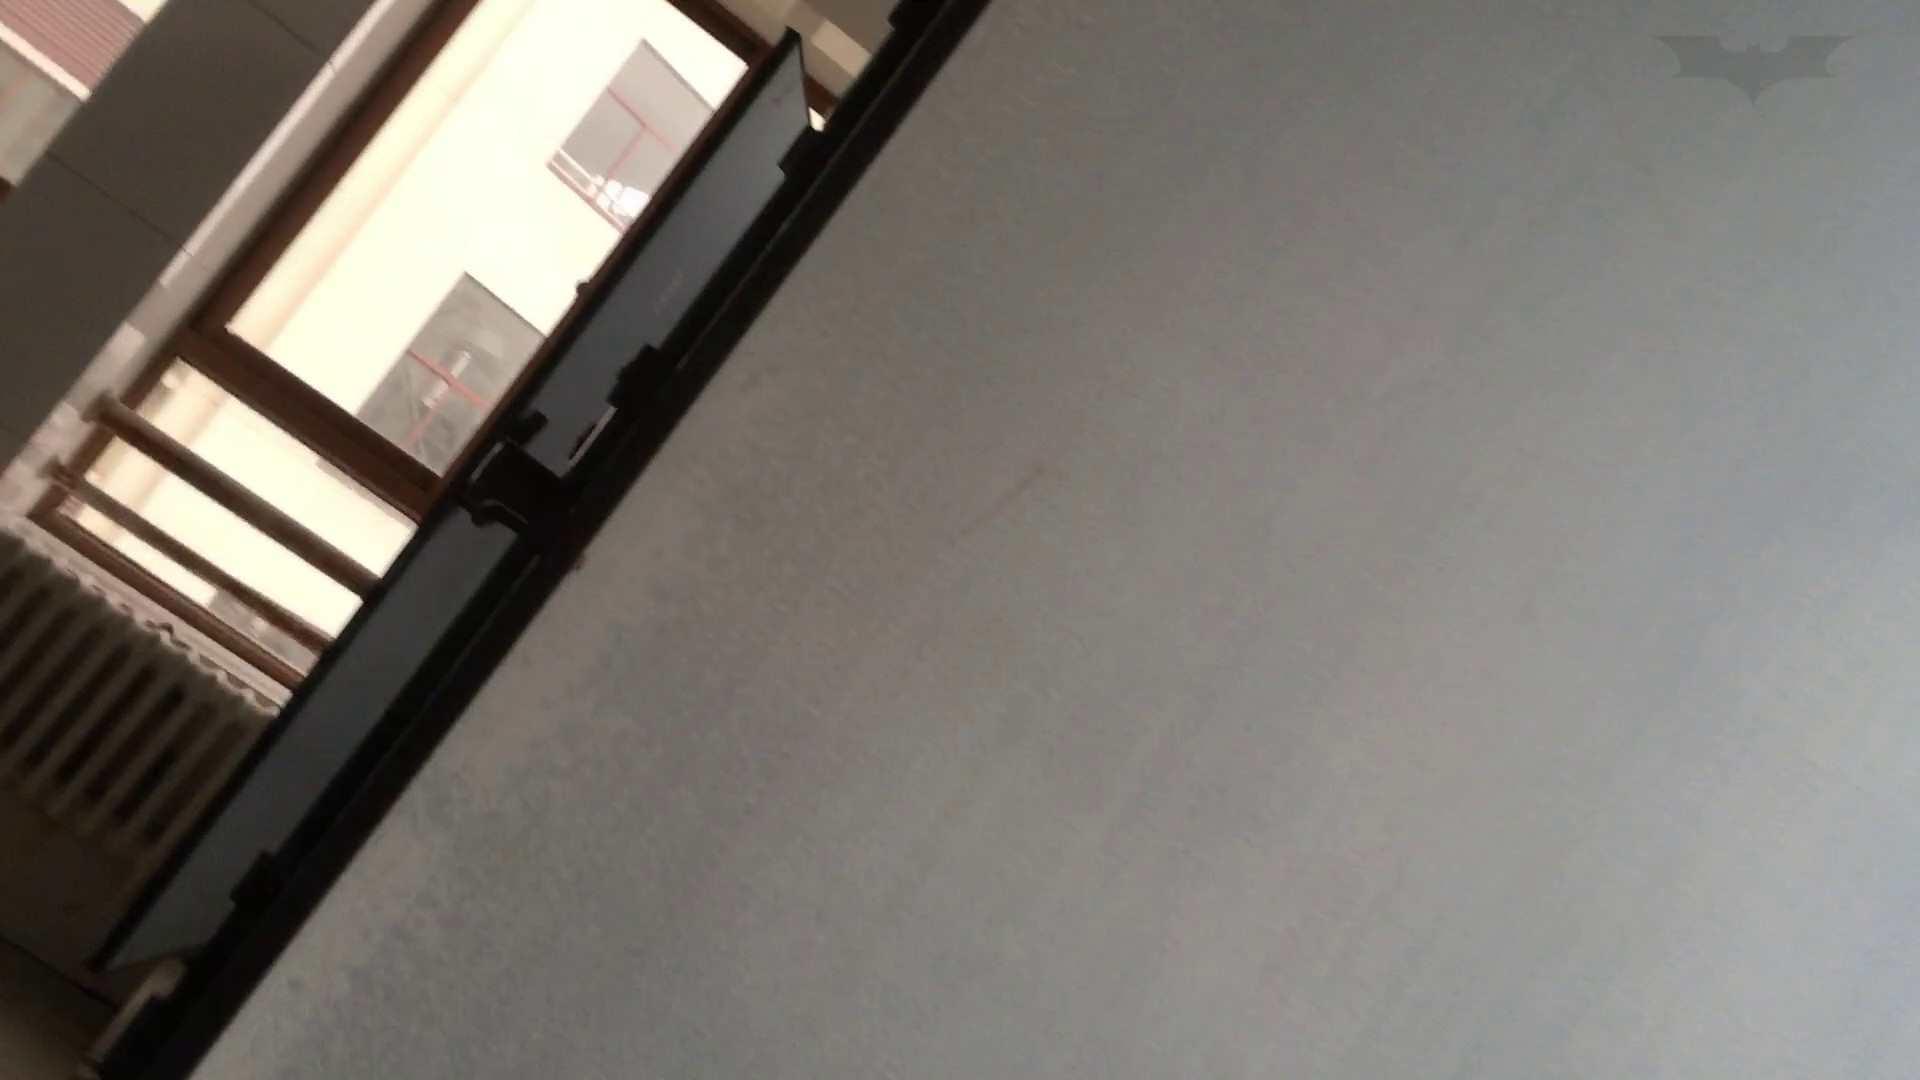 芸術大学ガチ潜入盗撮 JD盗撮 美女の洗面所の秘密 Vol.89 洗面所着替え | 潜入エロ調査  77連発 49